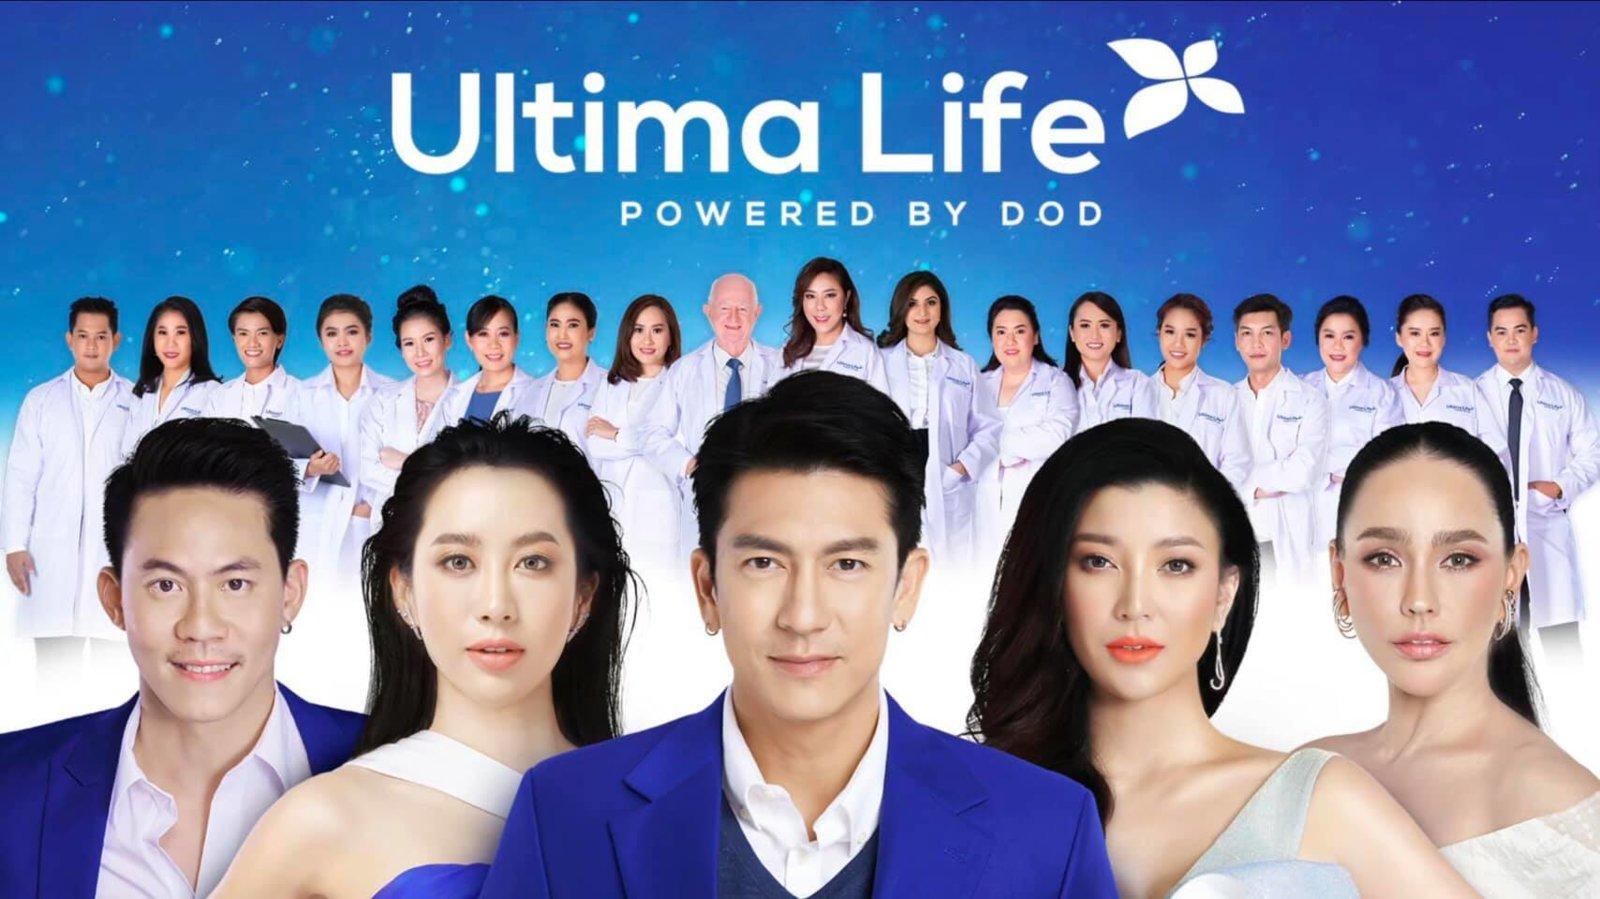 ultima-life-ธุรกิจเครือข่าย-มาแรง.jpg